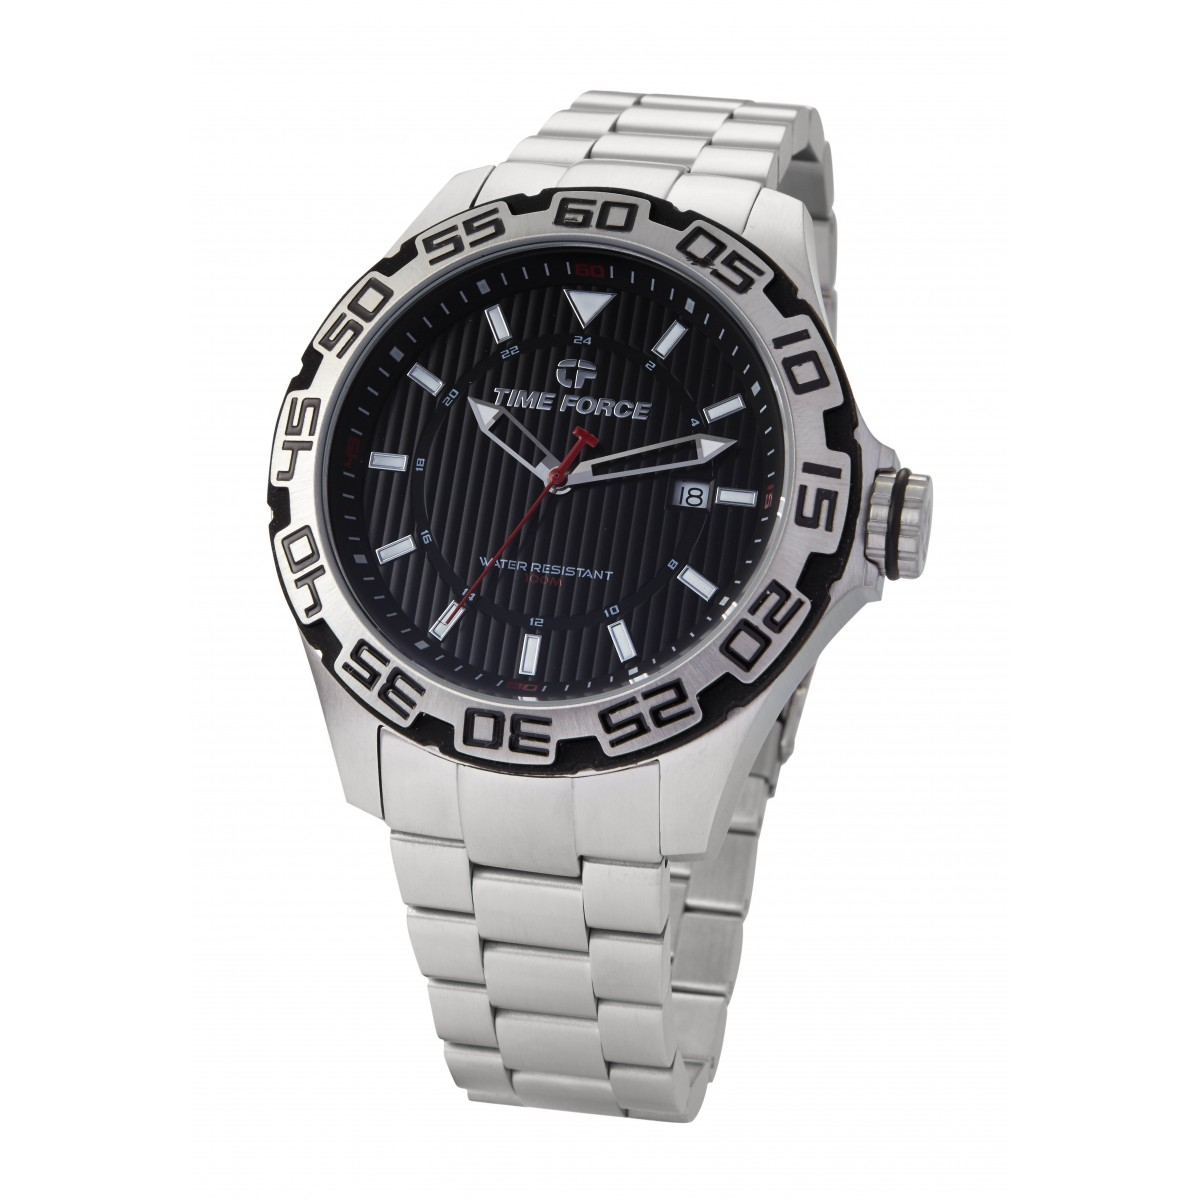 https://www.gaberjoyeria.com/2873-thickbox_default/reloj-time-force.jpg